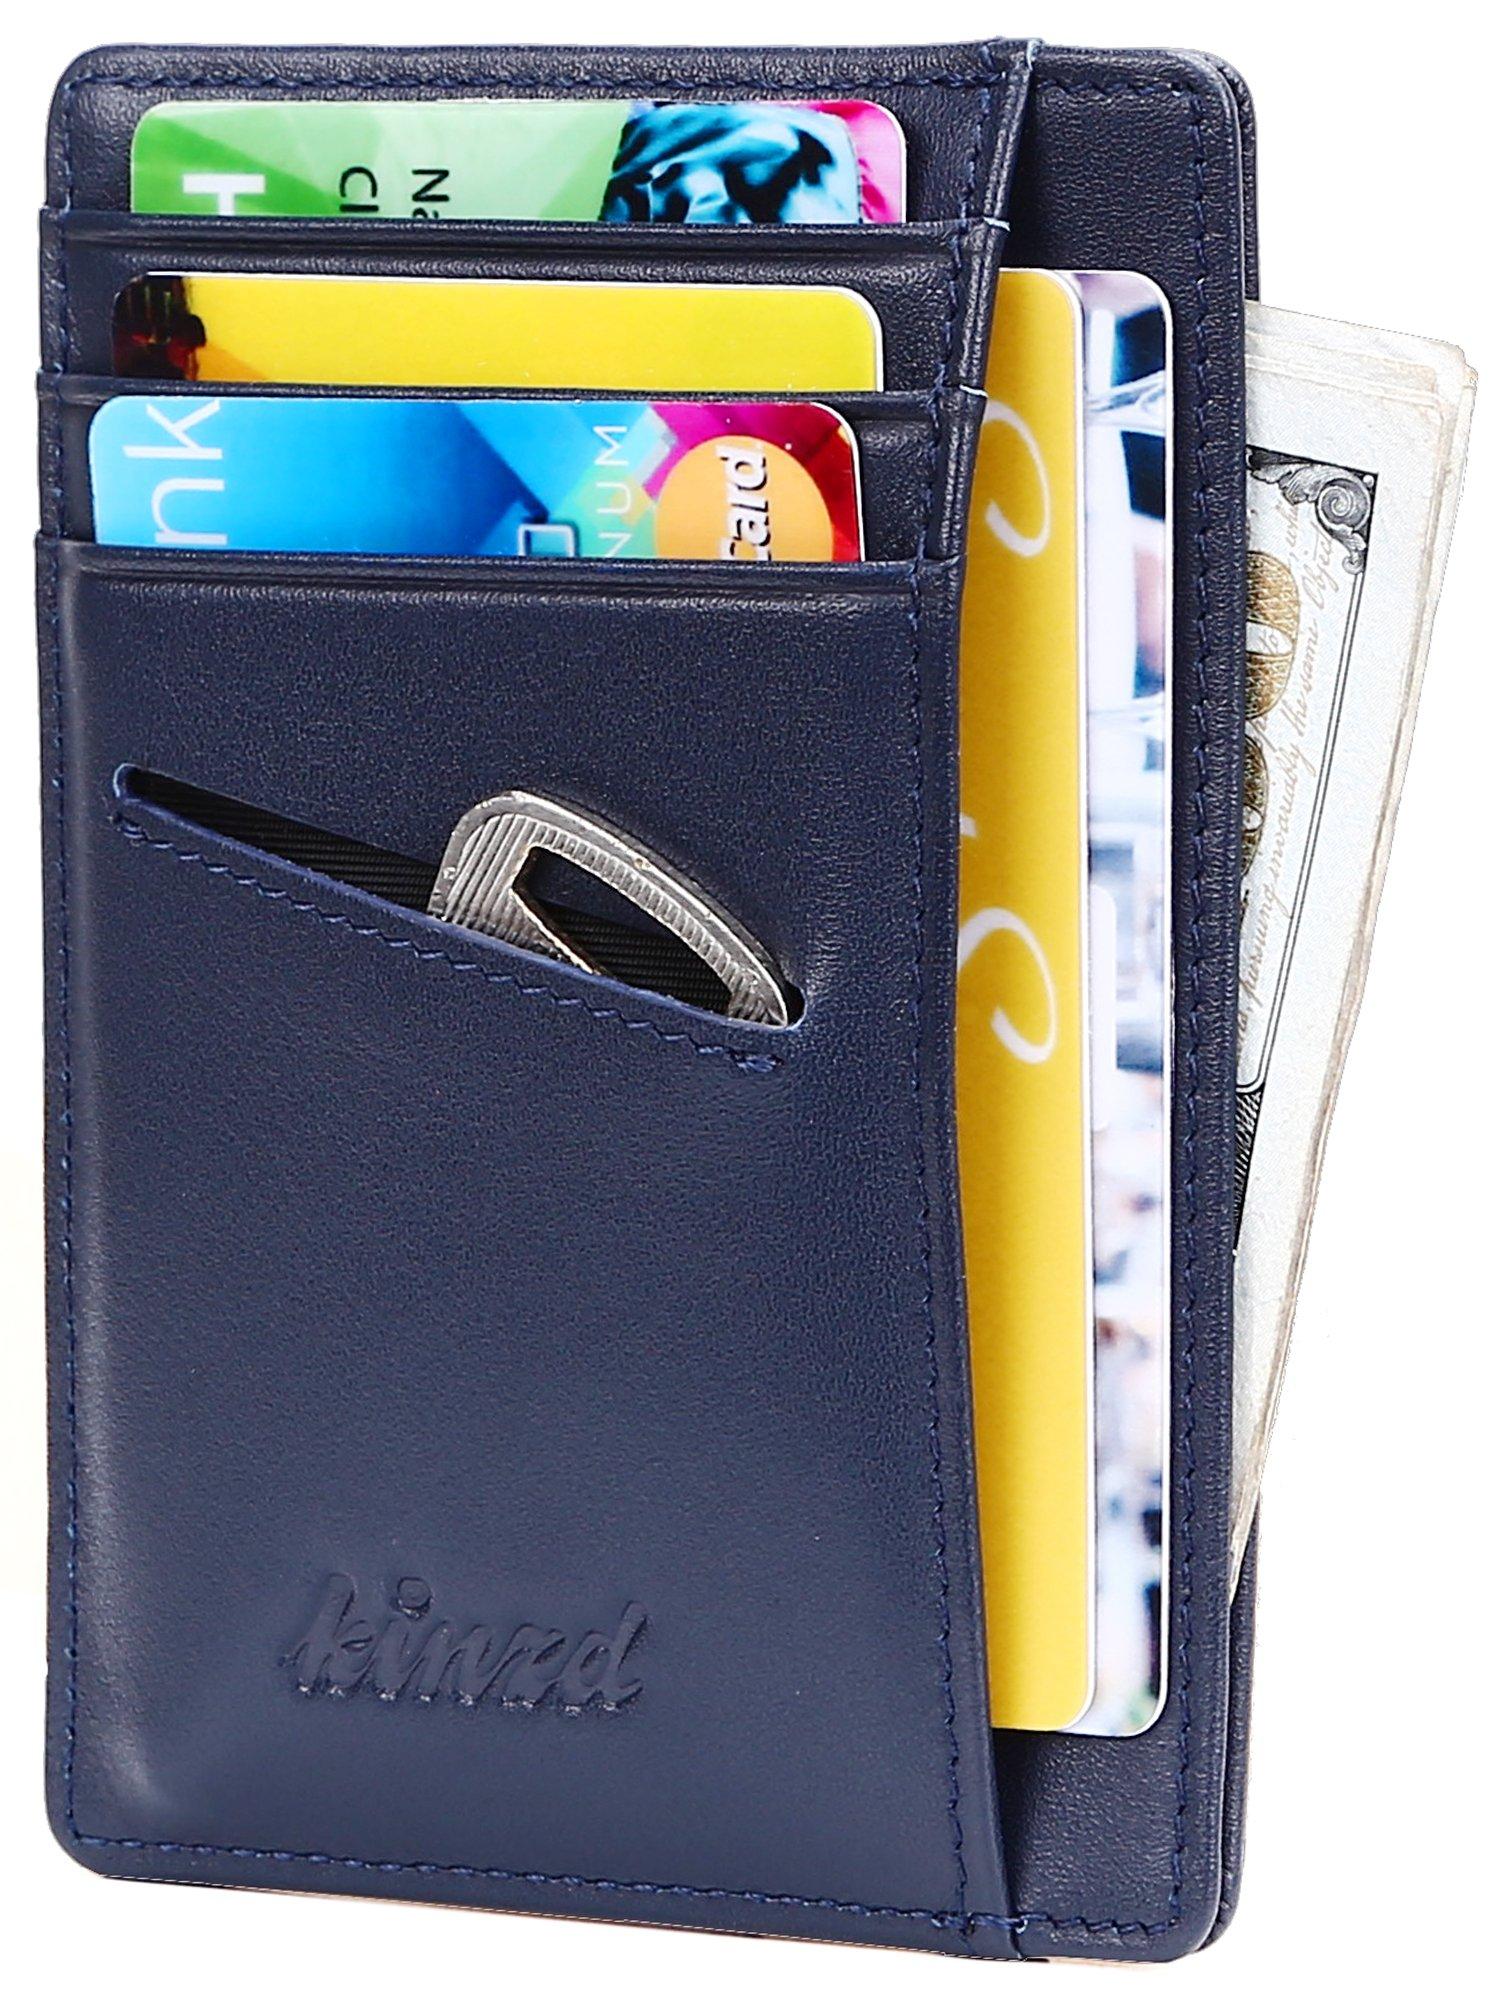 f39a19592ee8 Slim Wallet RFID Front Pocket Wallet Minimalist Secure Thin Credit Card  Holder